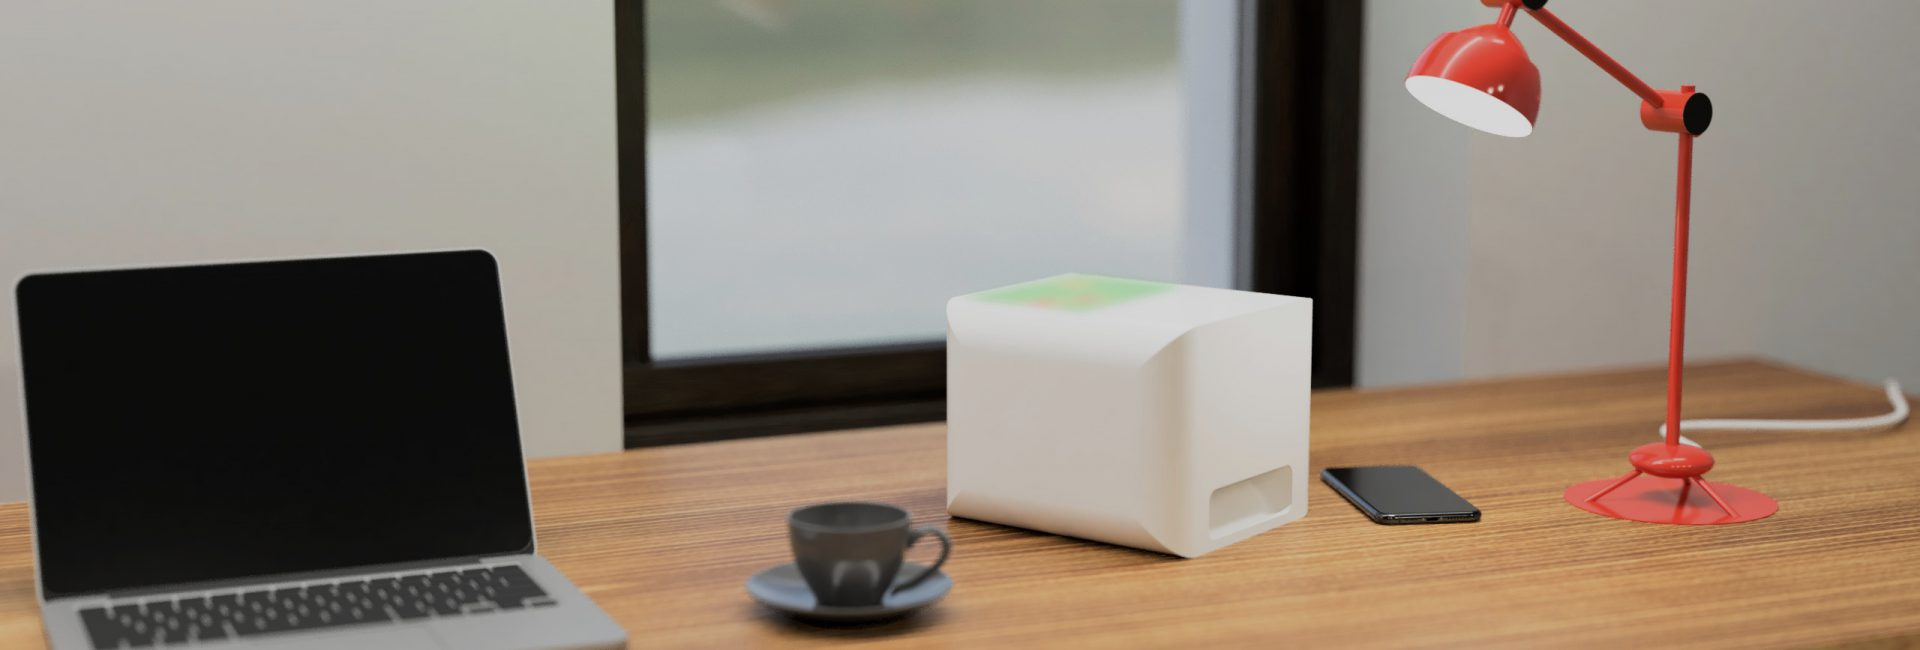 Smart Medication Dispenser